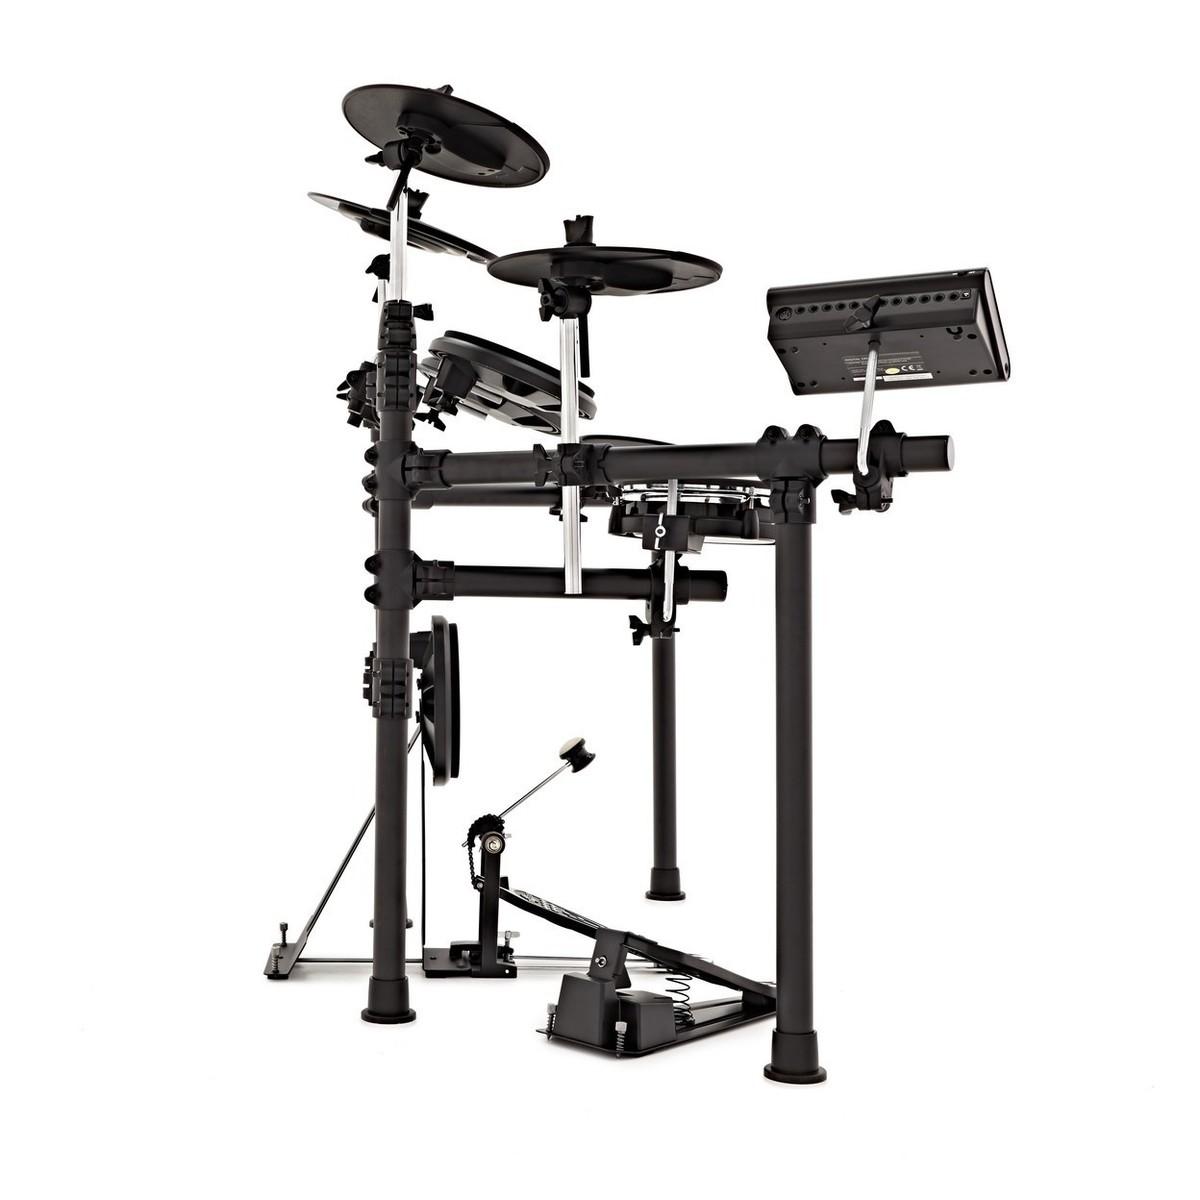 digital drums 450 electronic drum kit and amp pack at gear4music. Black Bedroom Furniture Sets. Home Design Ideas